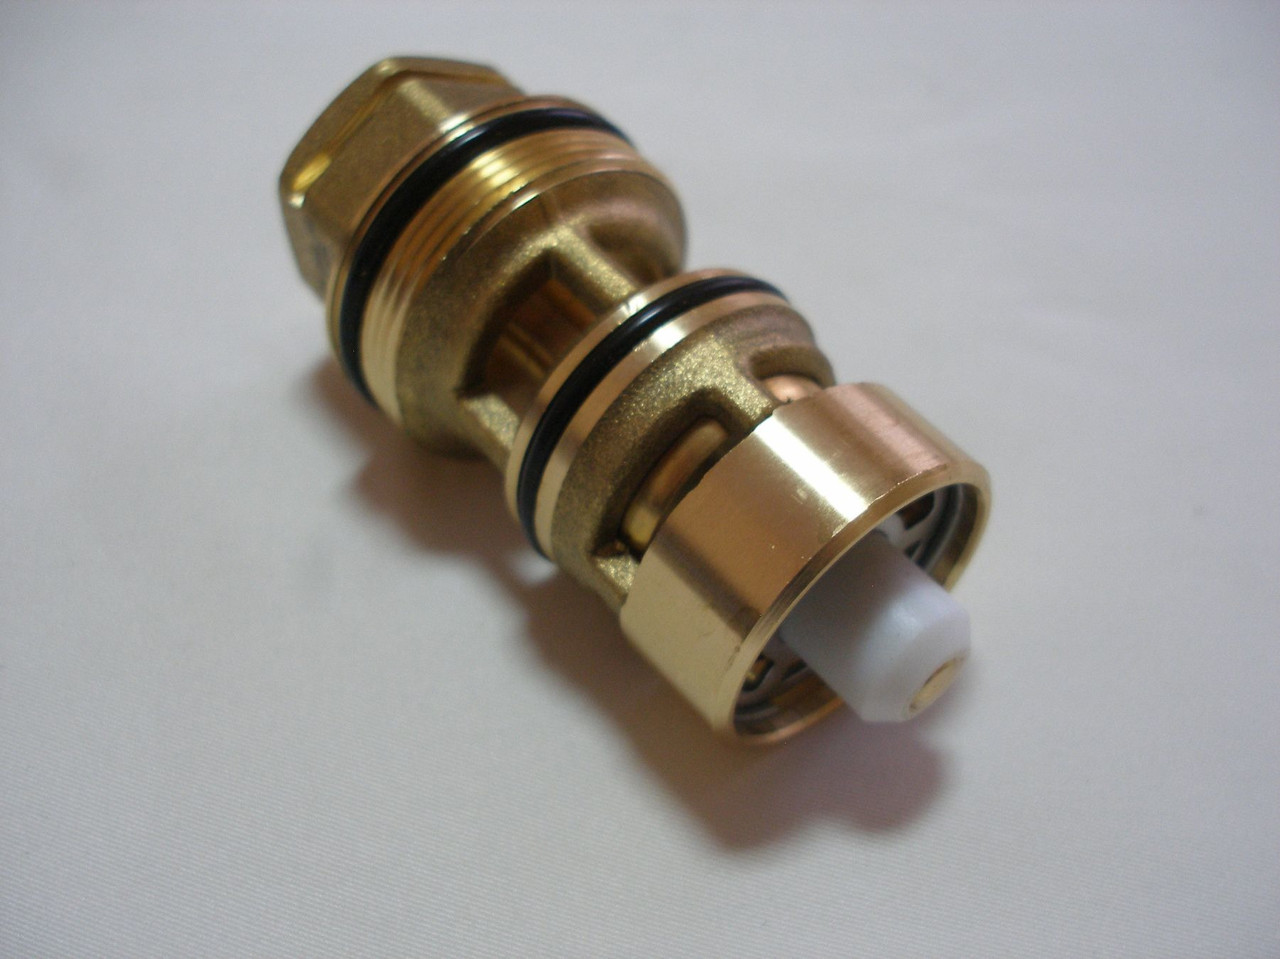 3-х ходовой клапан Junkers / Bocsh ZW23-1AE, ZW23-1KE 8708500372